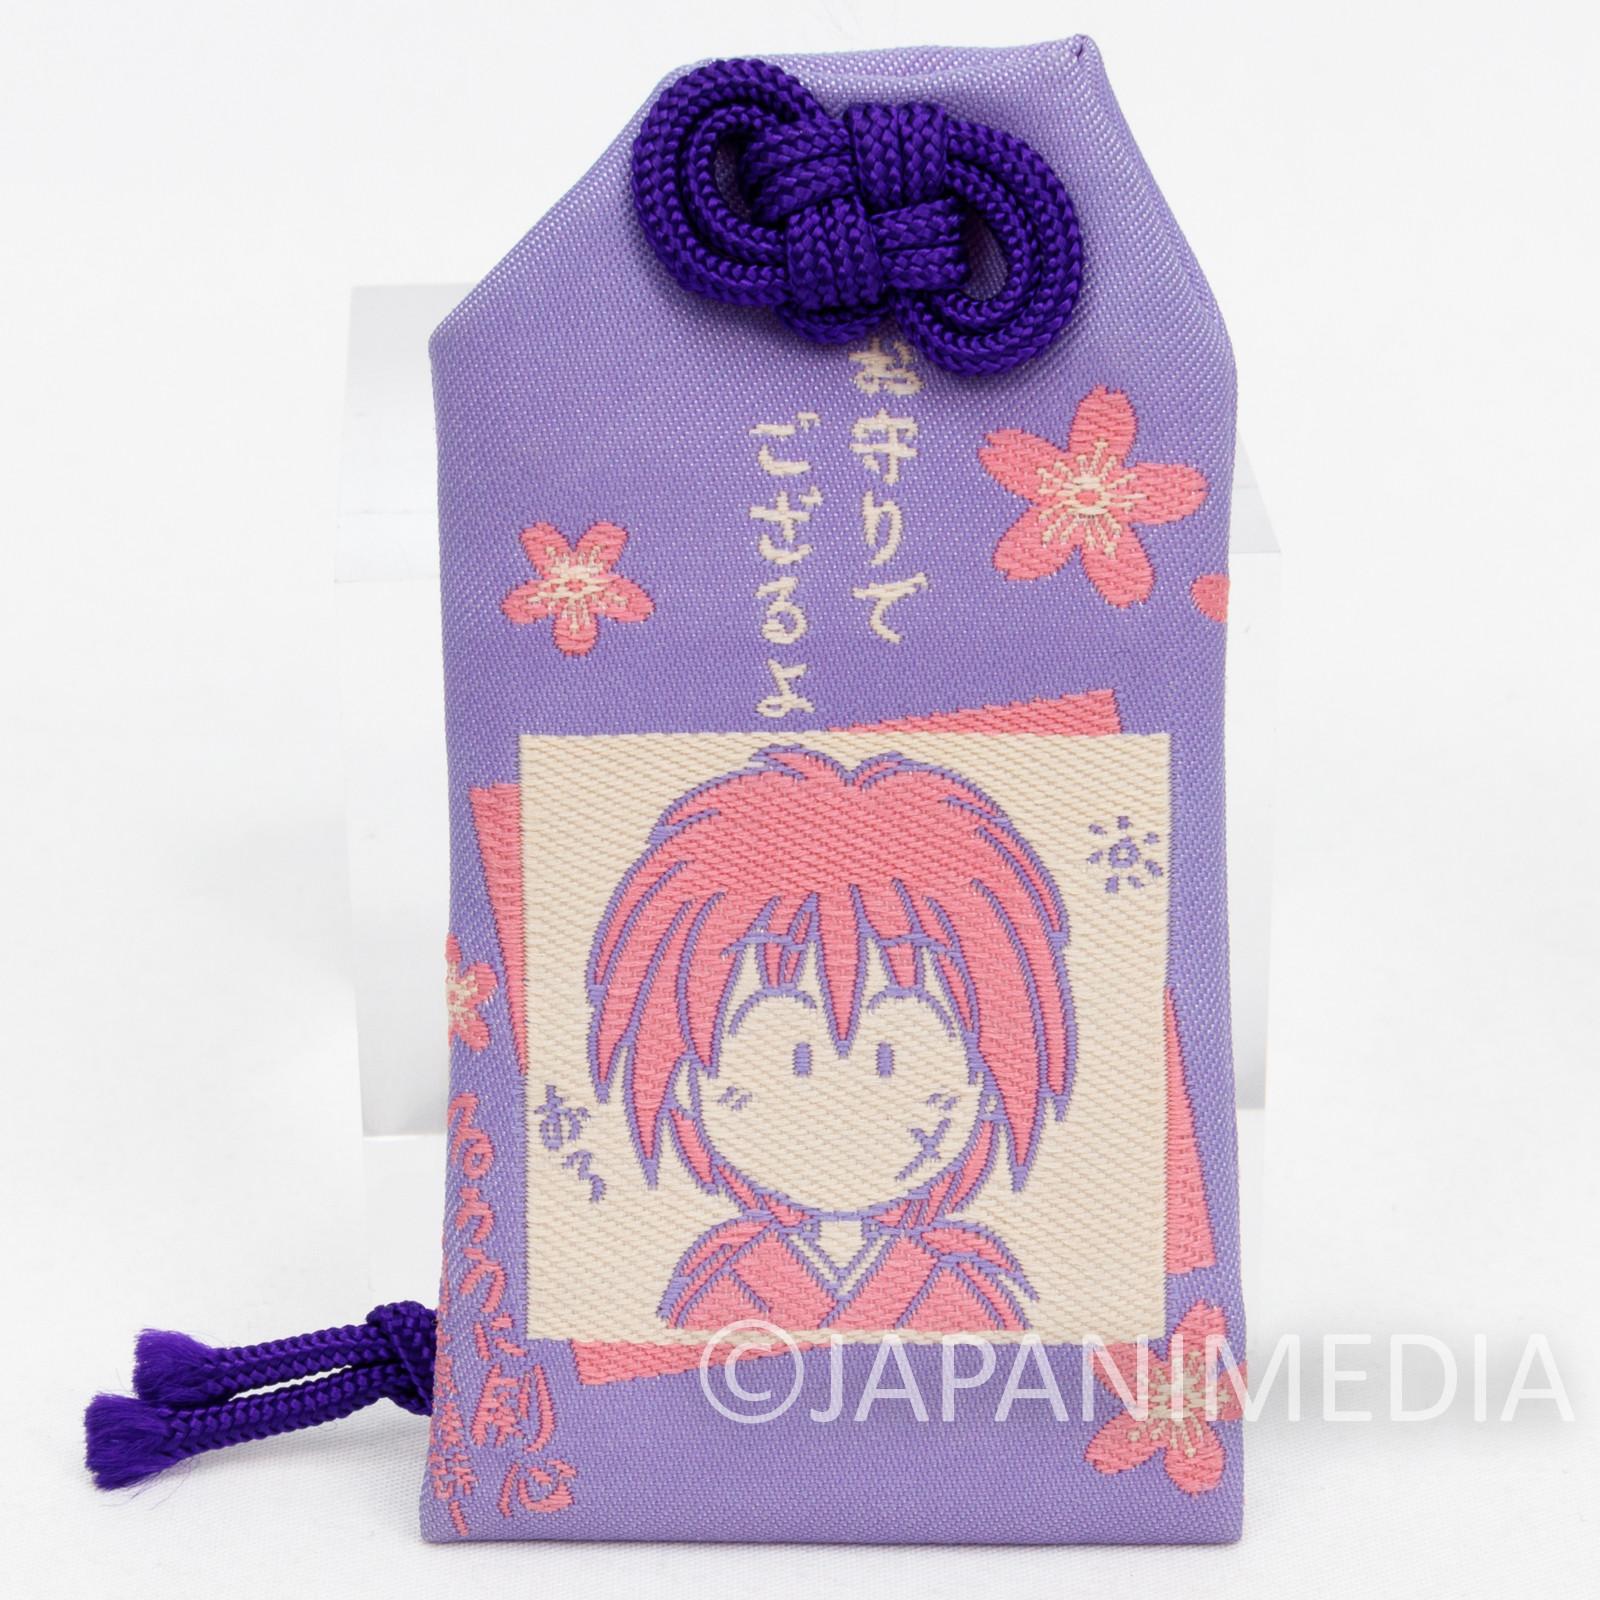 Retro Rurouni Kenshin Talisman Omamori JAPAN ANIME